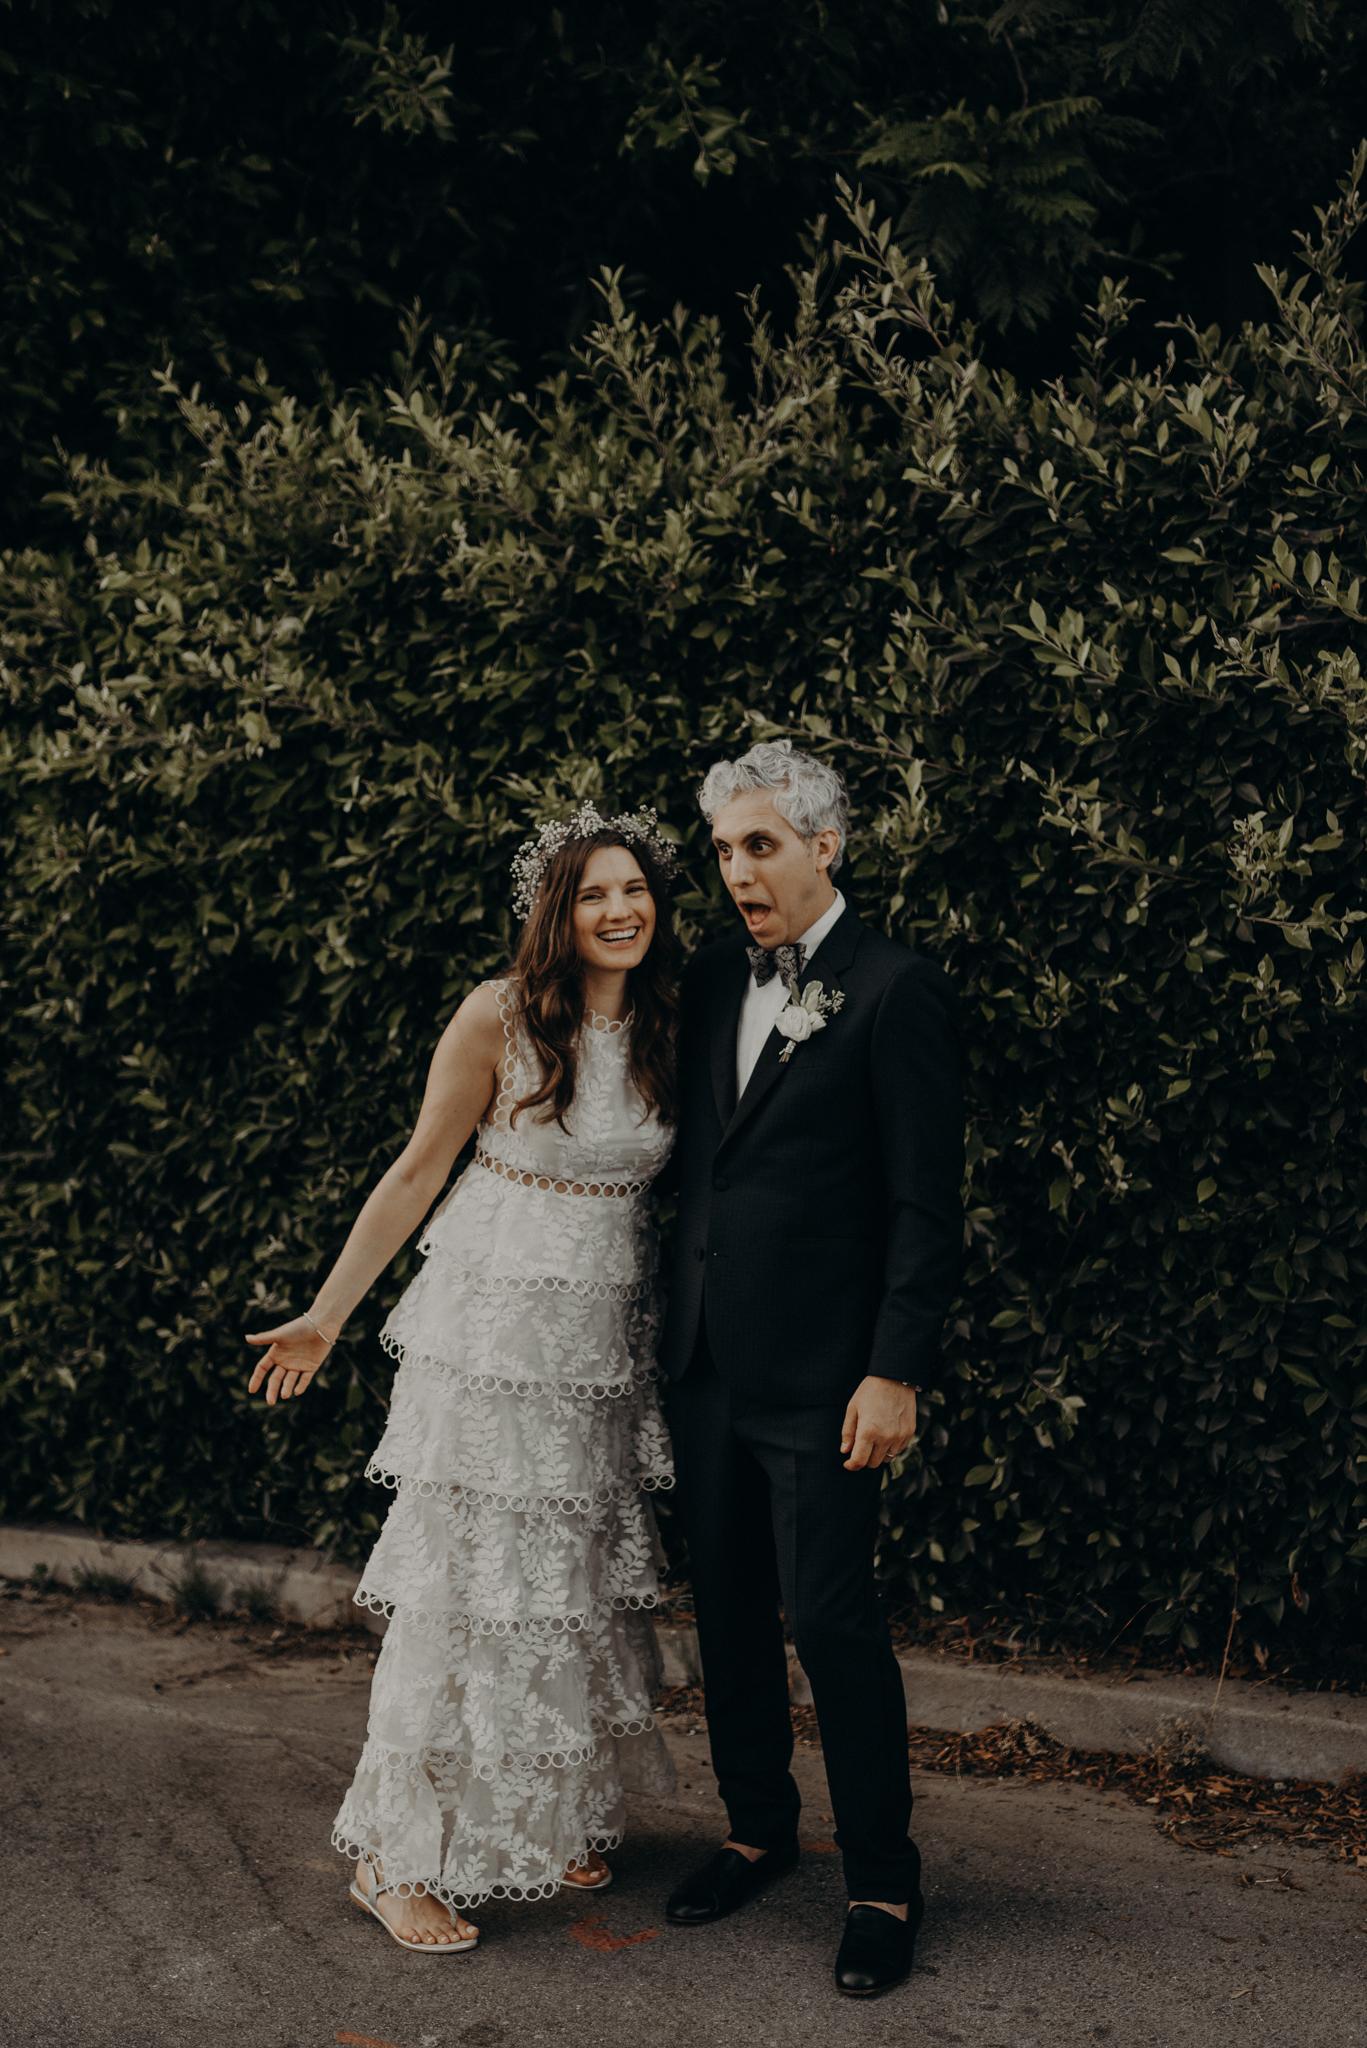 Isaiah + Taylor Photography - Private Estate Backyard Wedding - Beverly Hills - Los Angeles Wedding Photographer - 118.jpg